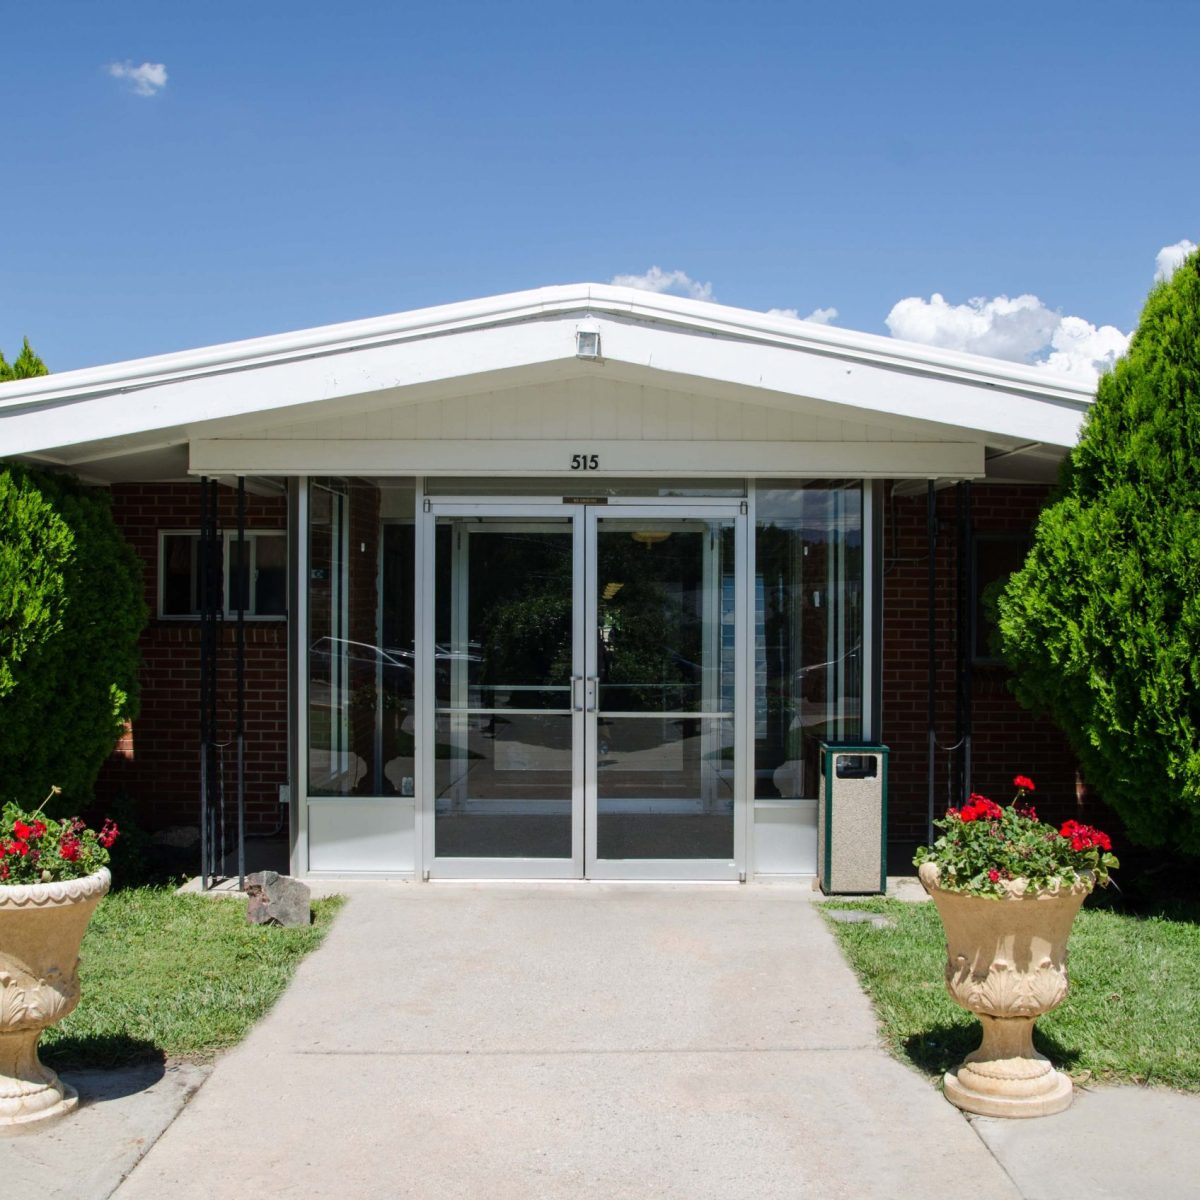 Skyline Ridge Nursing & Rehab Center Entrance